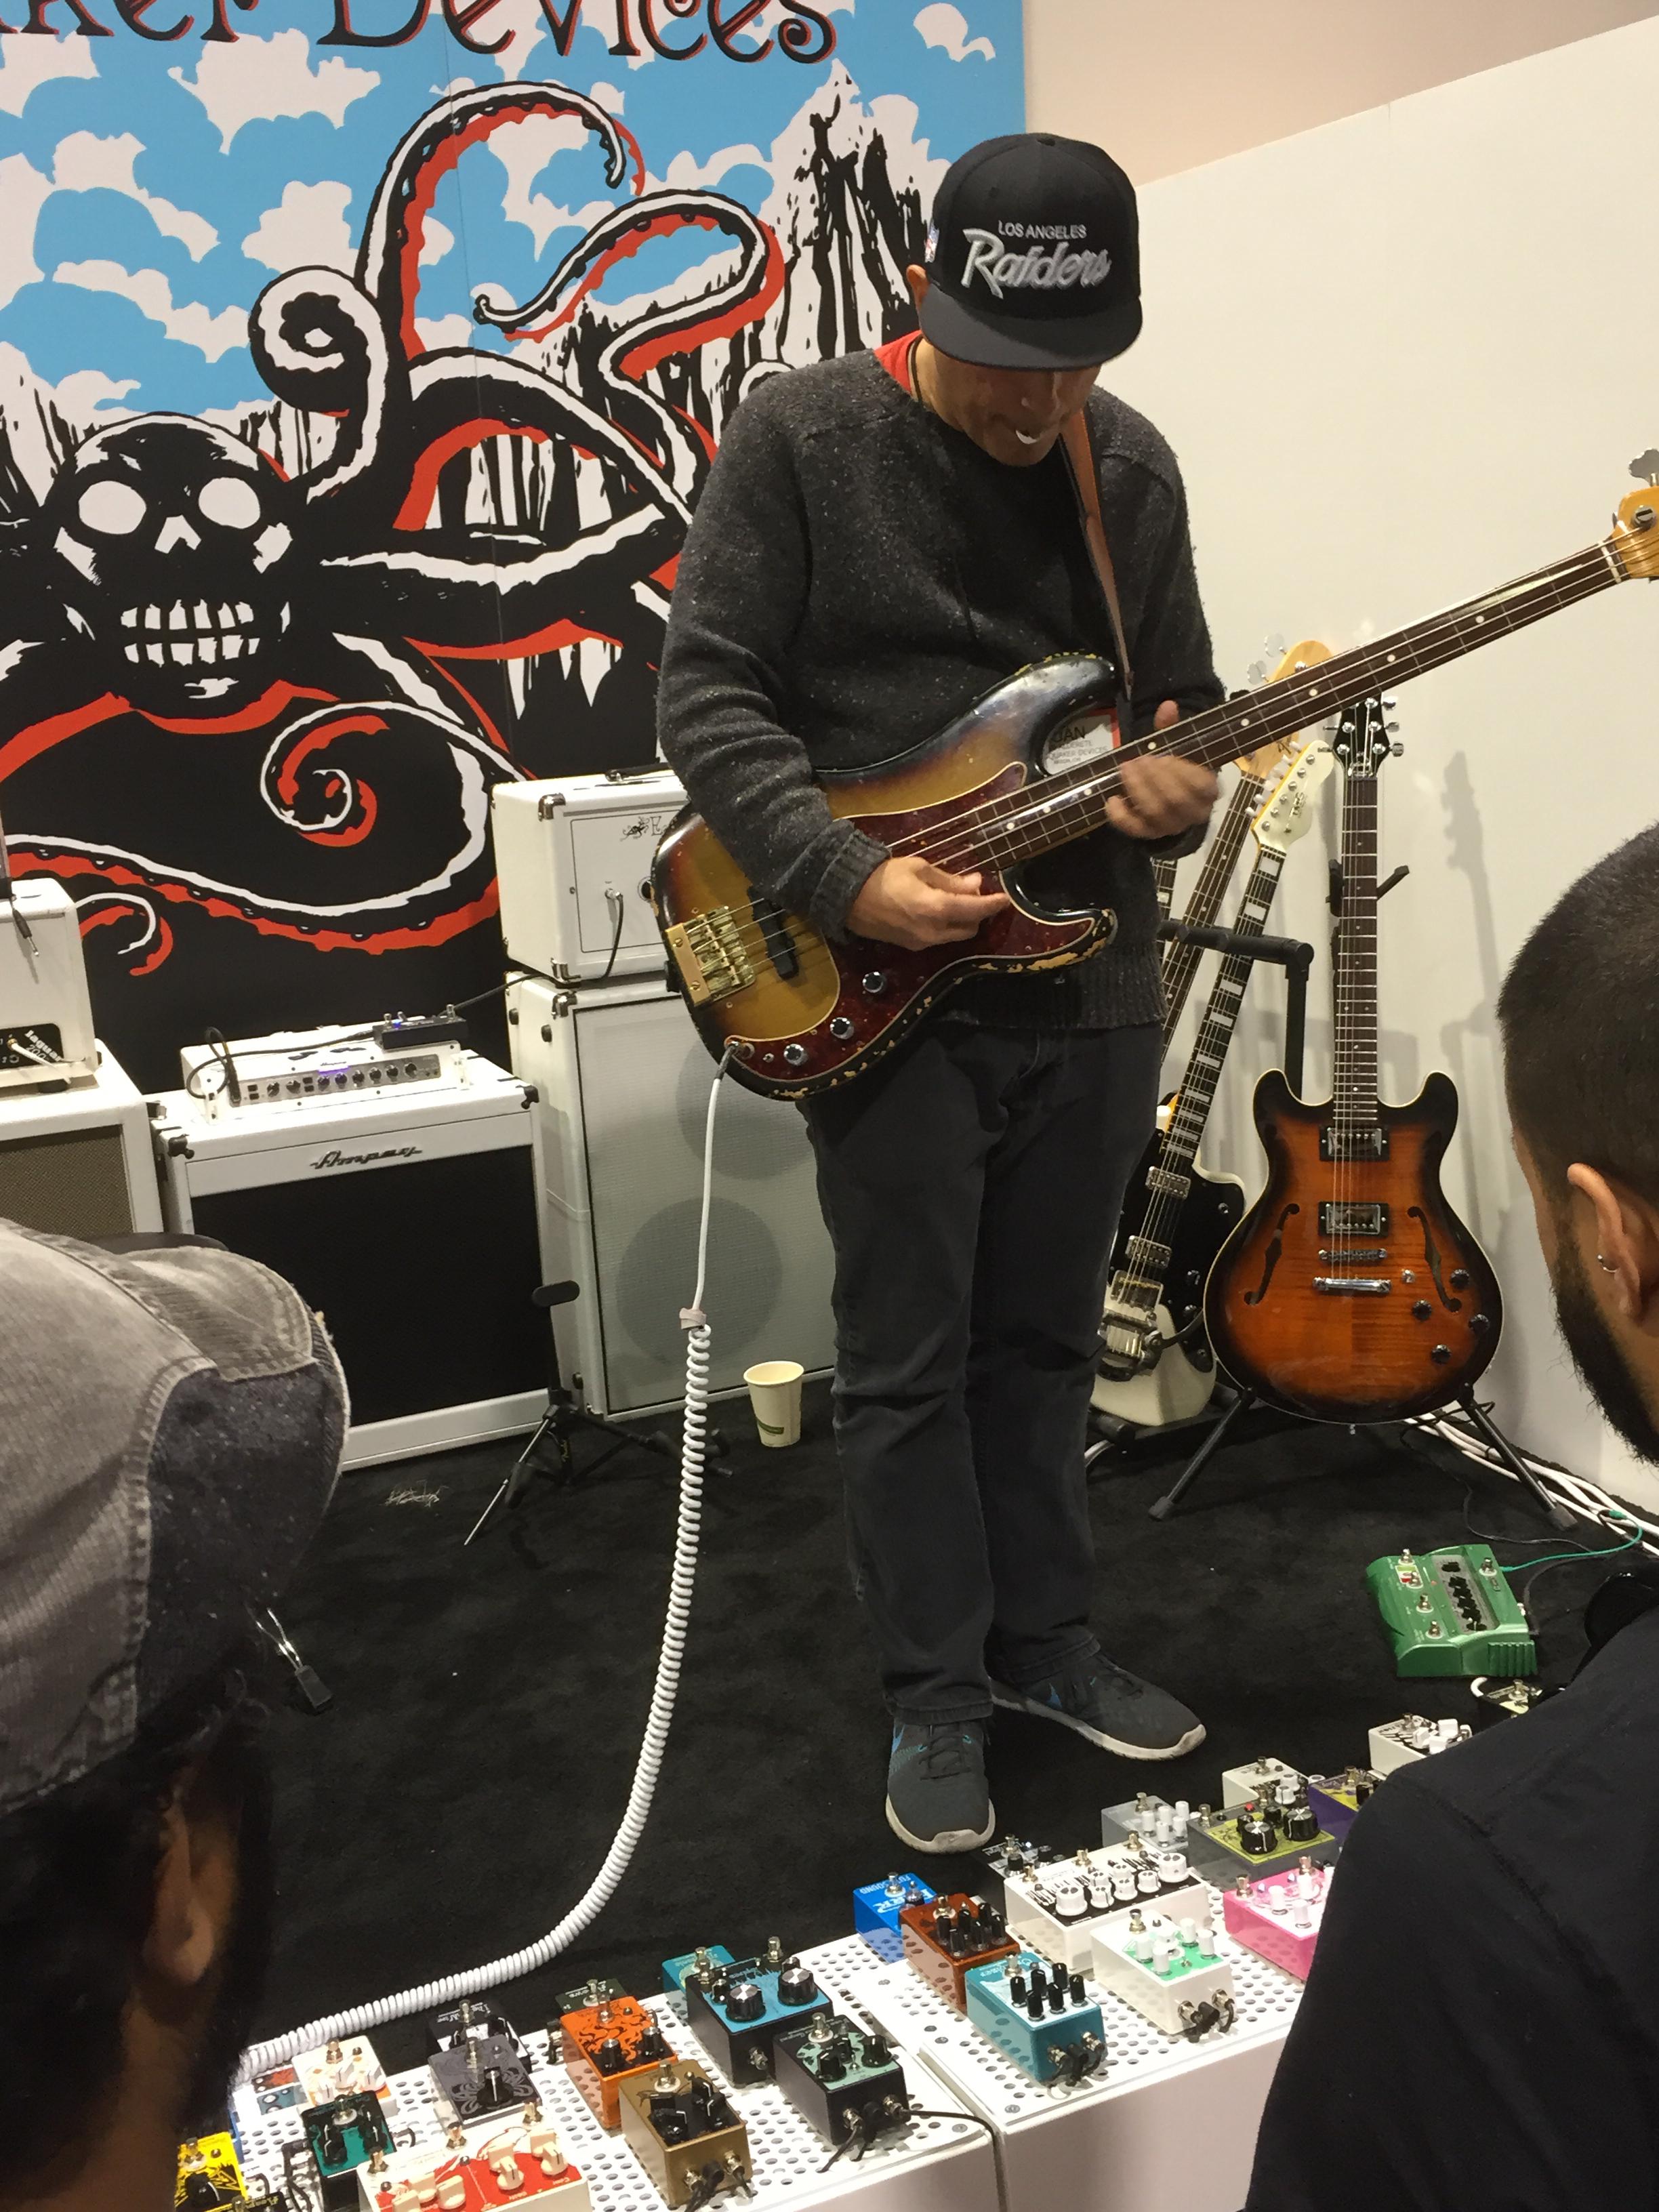 Photo credit: Guitar Moderne